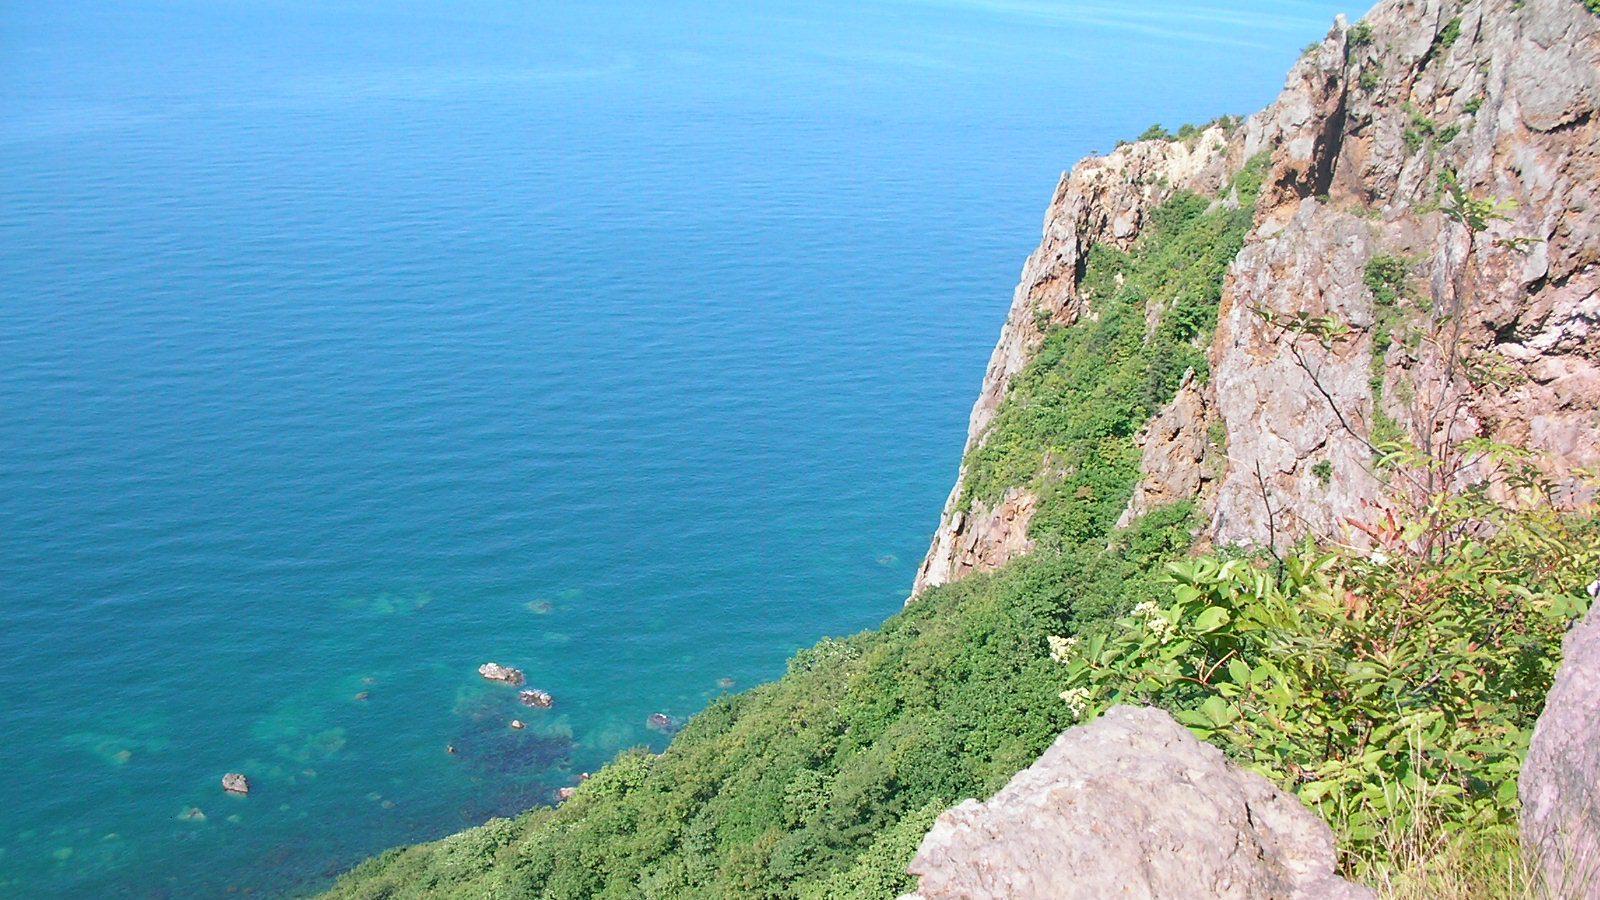 Northern Otaru Nature and History